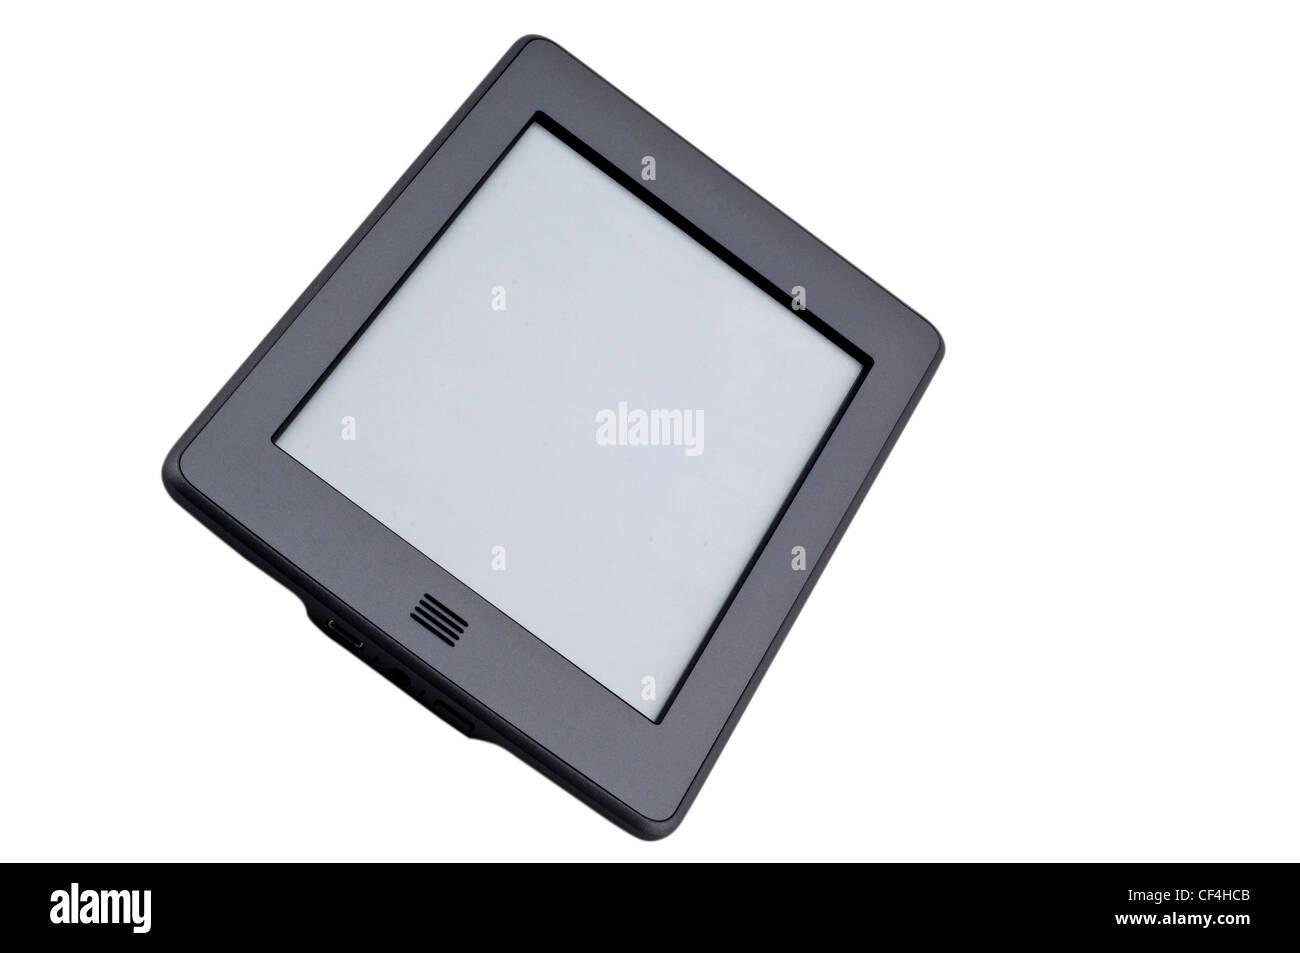 Ebook reader device on isolated white background - Stock Image